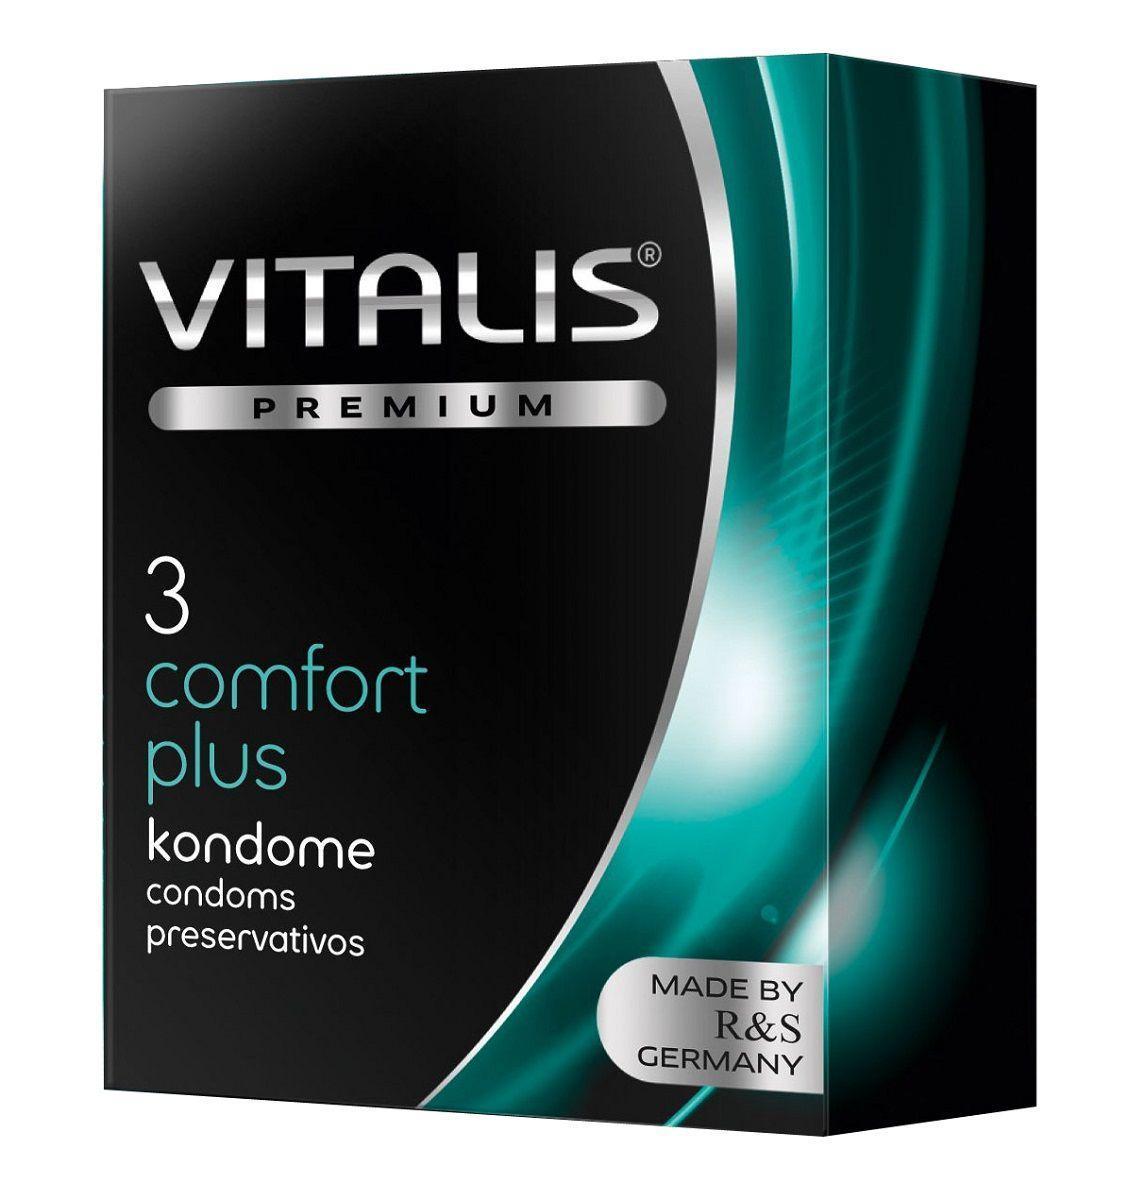 Контурные презервативы VITALIS PREMIUM comfort plus - 3 шт.